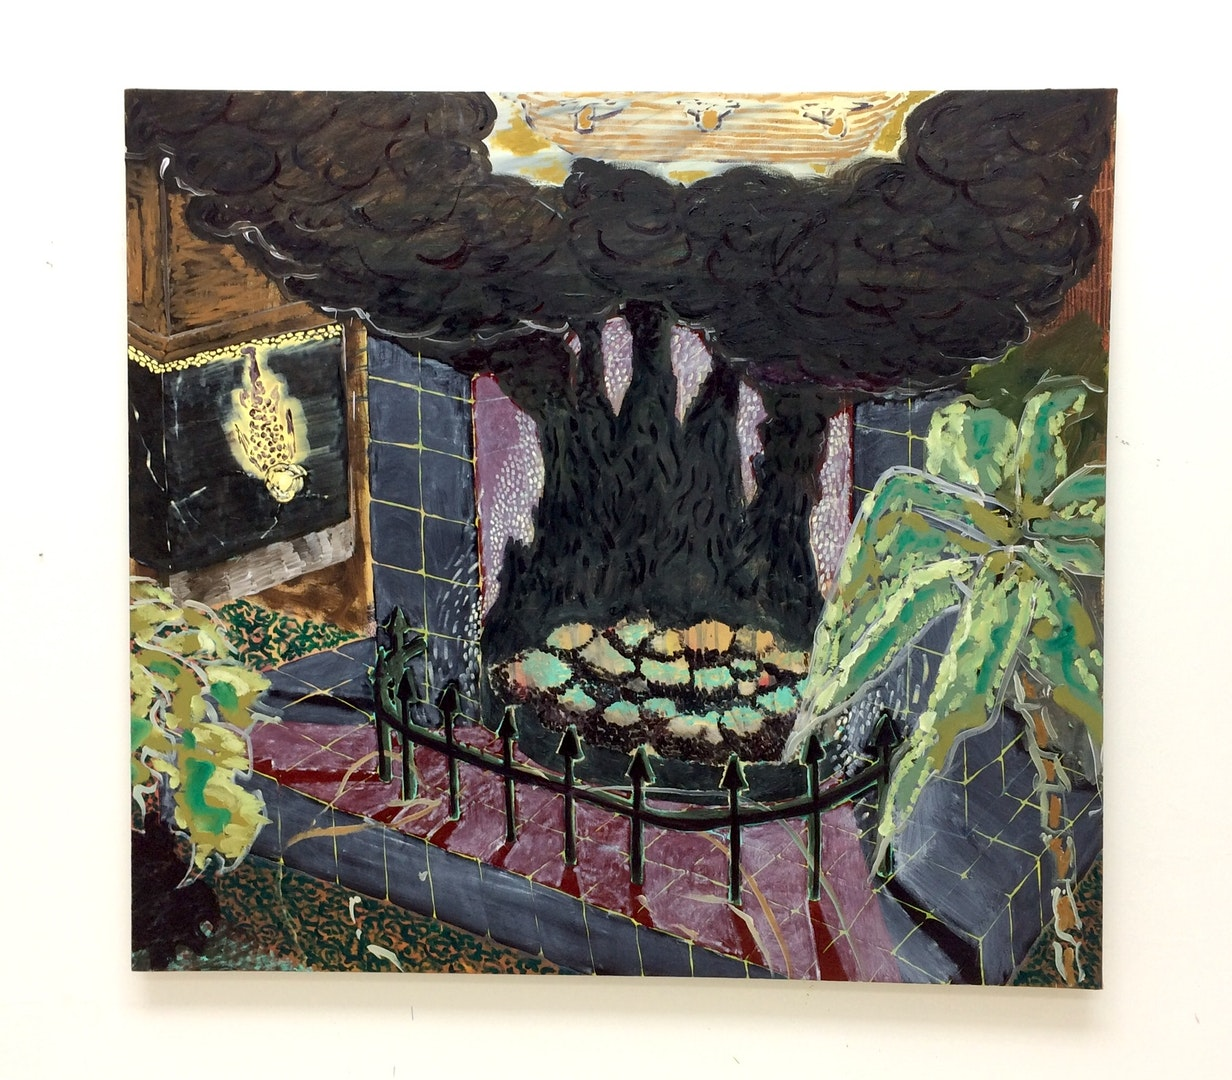 Max Gimson  Black-Fire Place  Oil on canvas, 145 x 135 cm  http://www.maxgimson.com